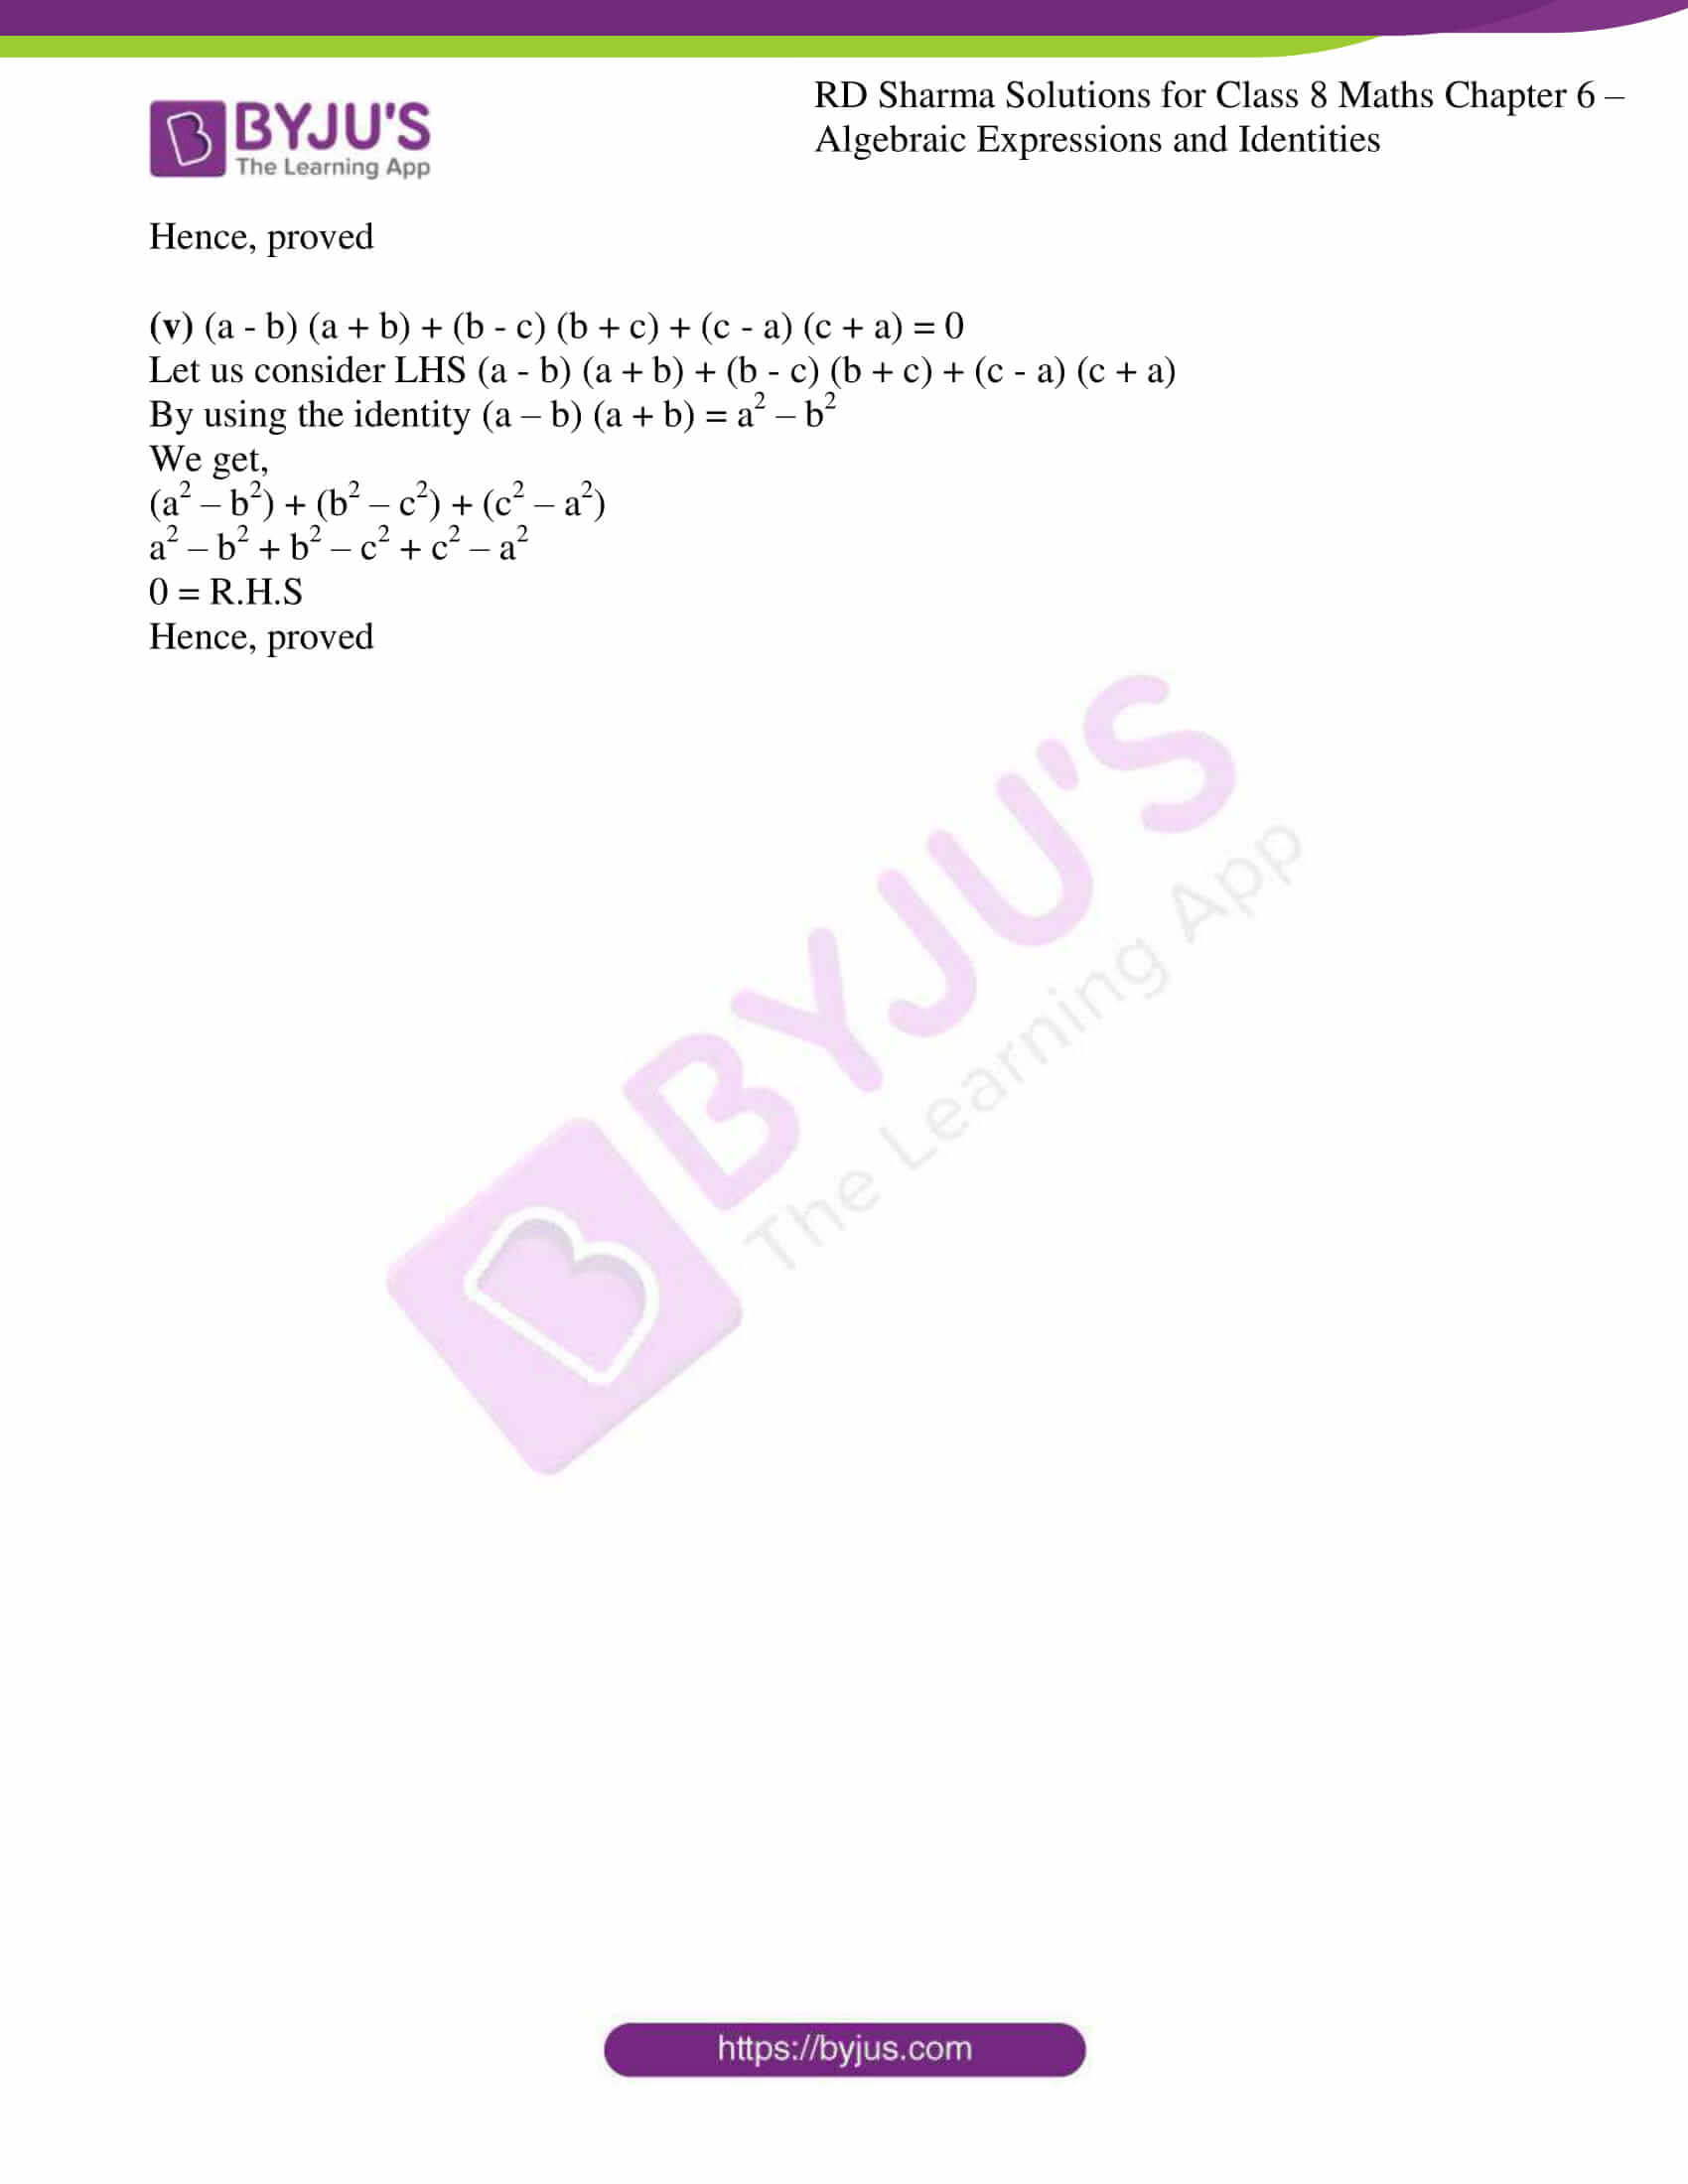 rd sharma class 8 maths chapter 6 exercise 6 17